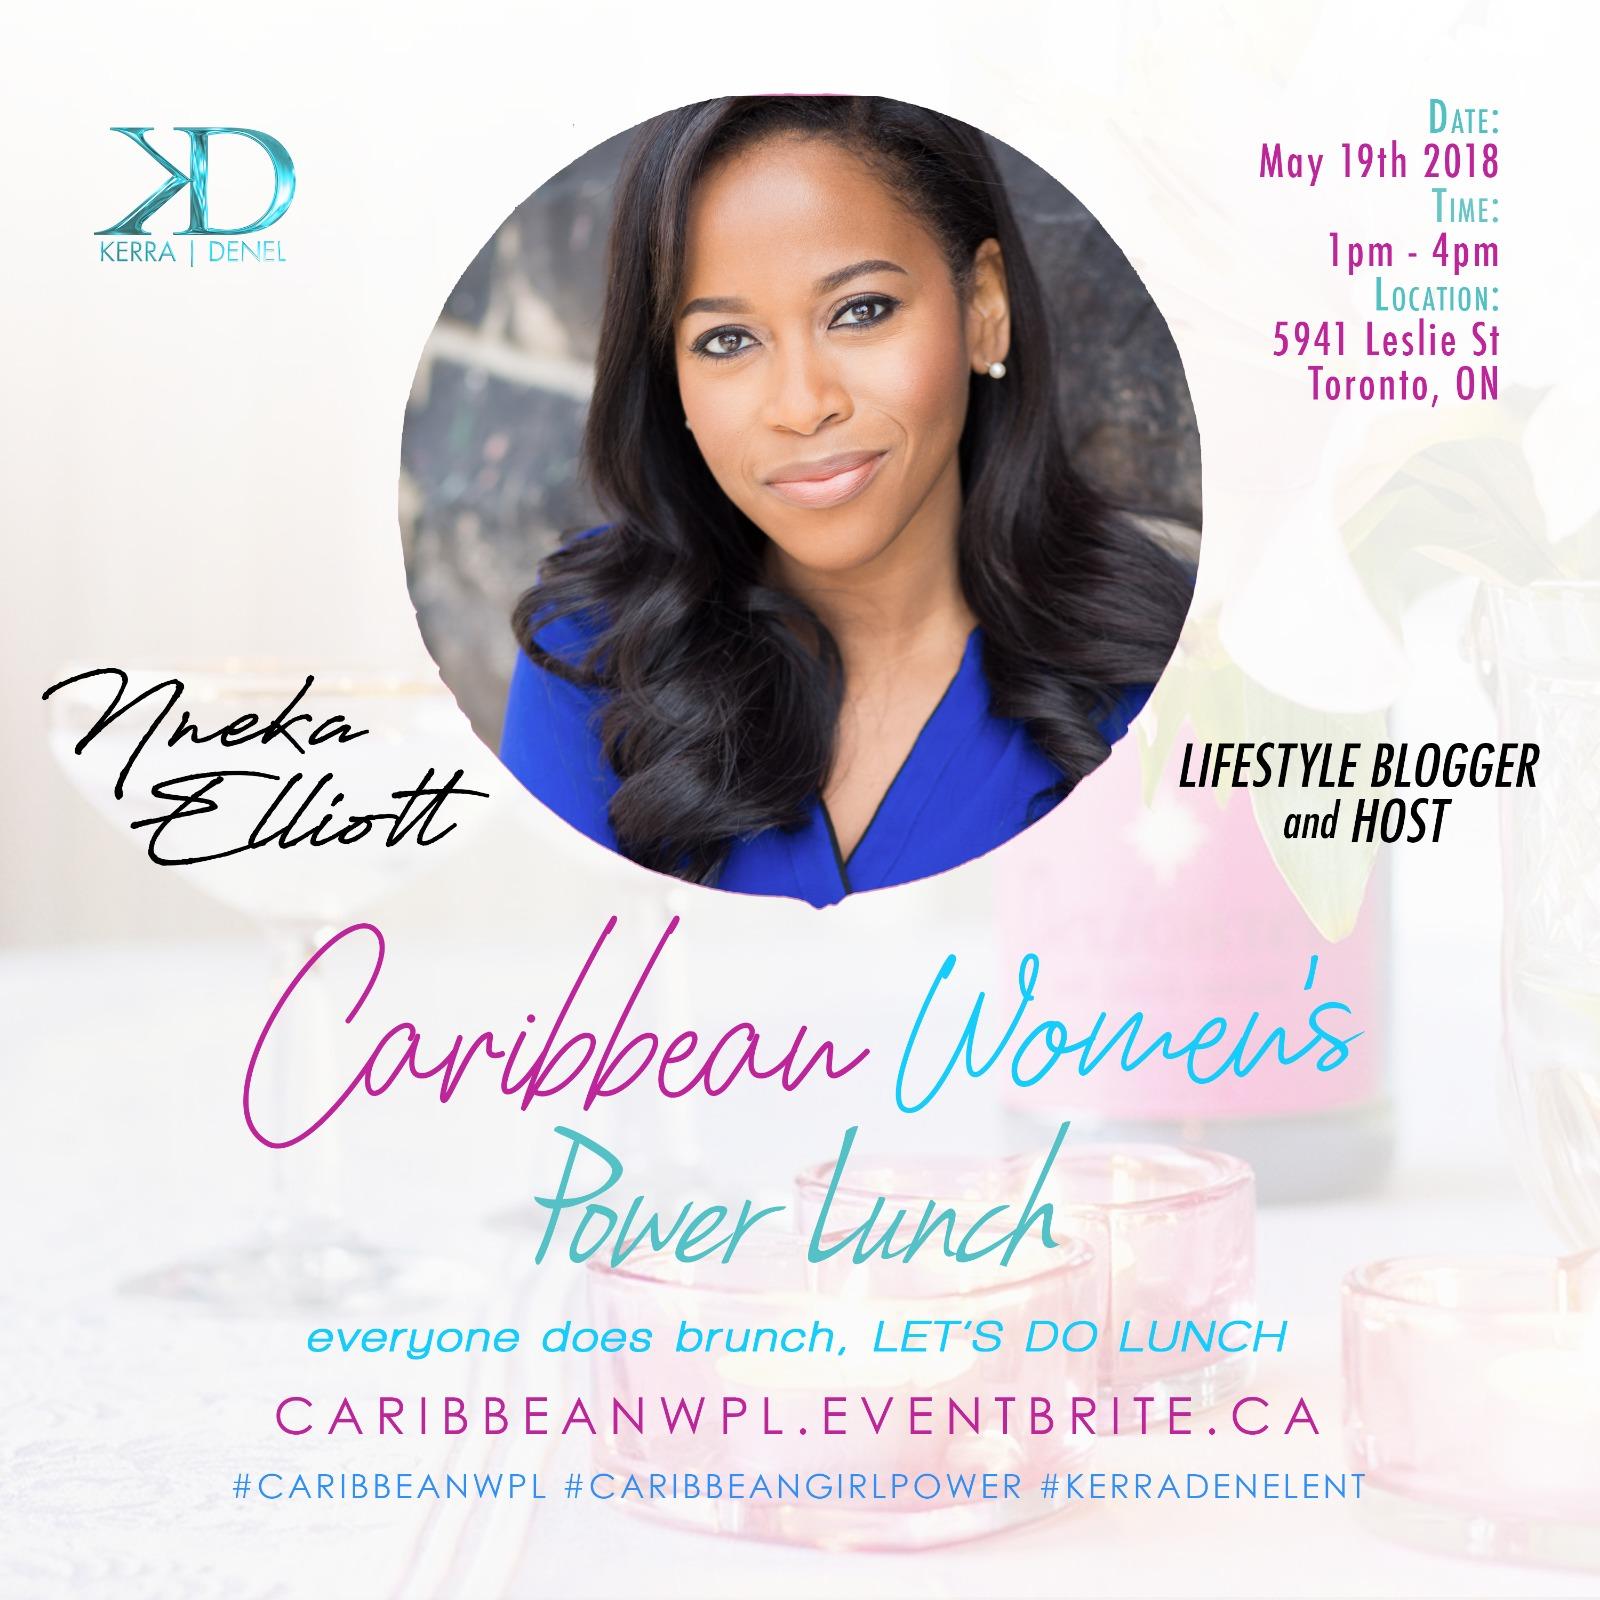 Dating caribbean women